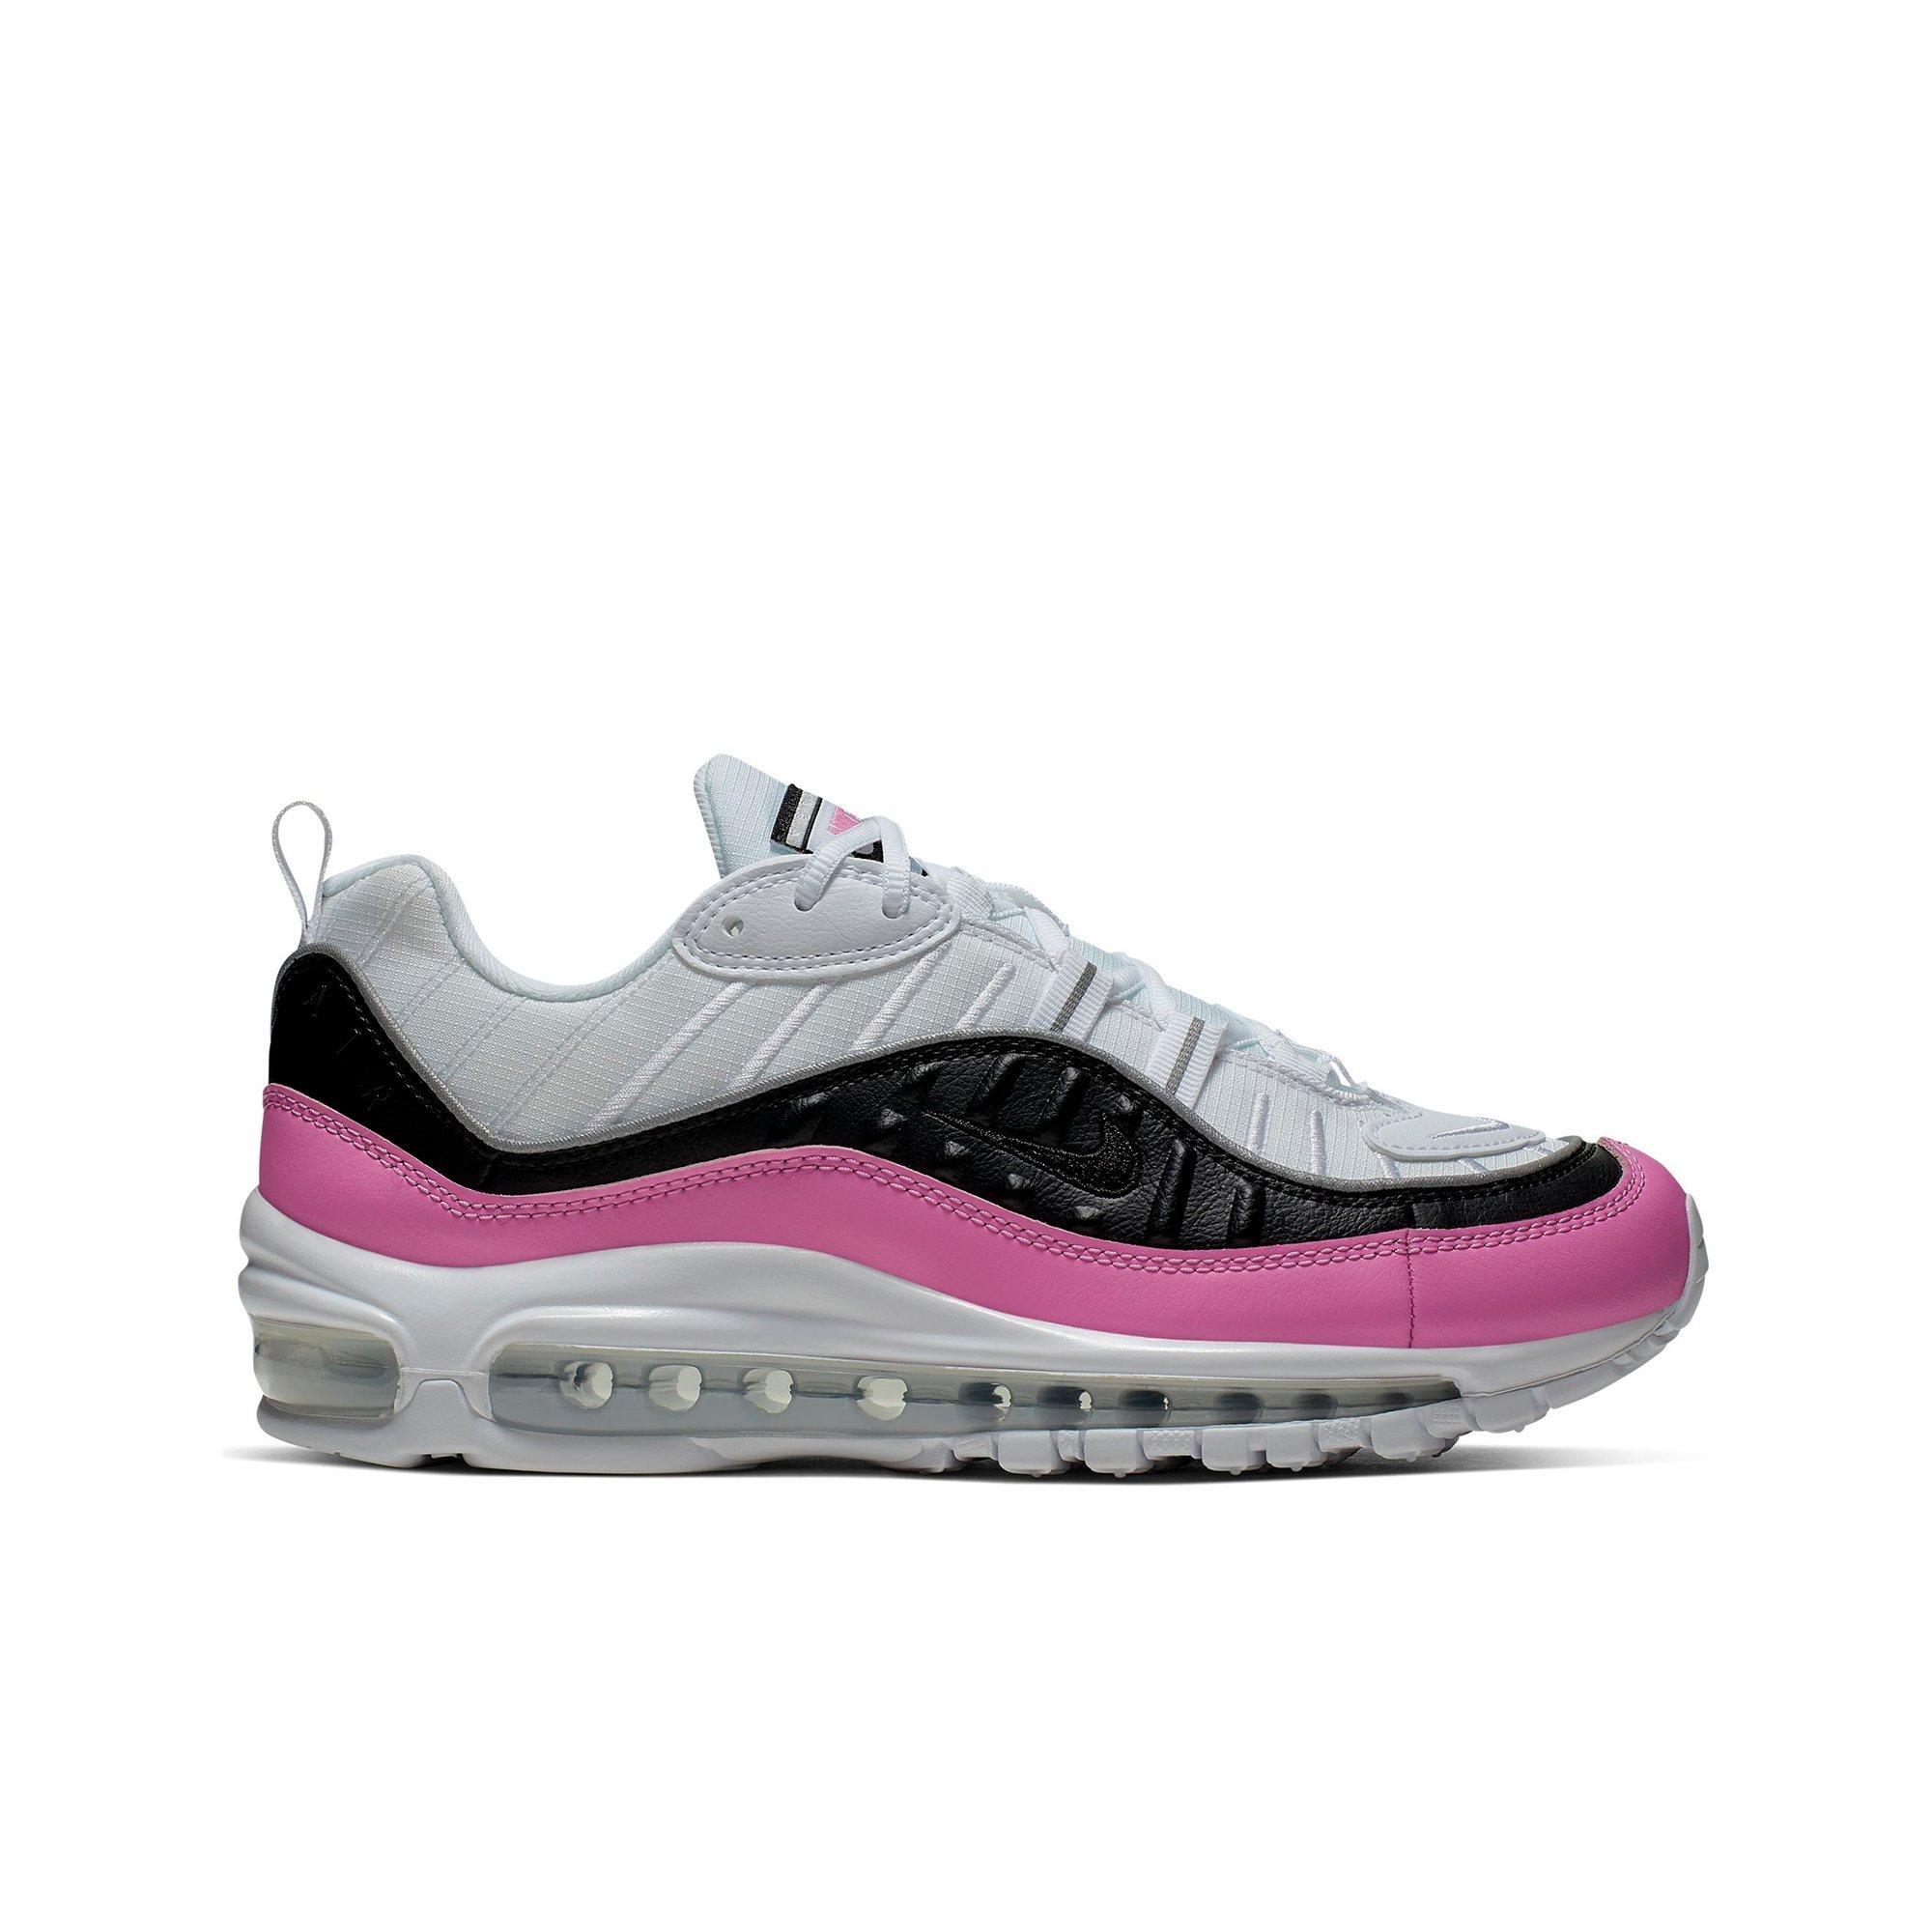 mizuno mens running shoes size 9 youth gold female women' chino